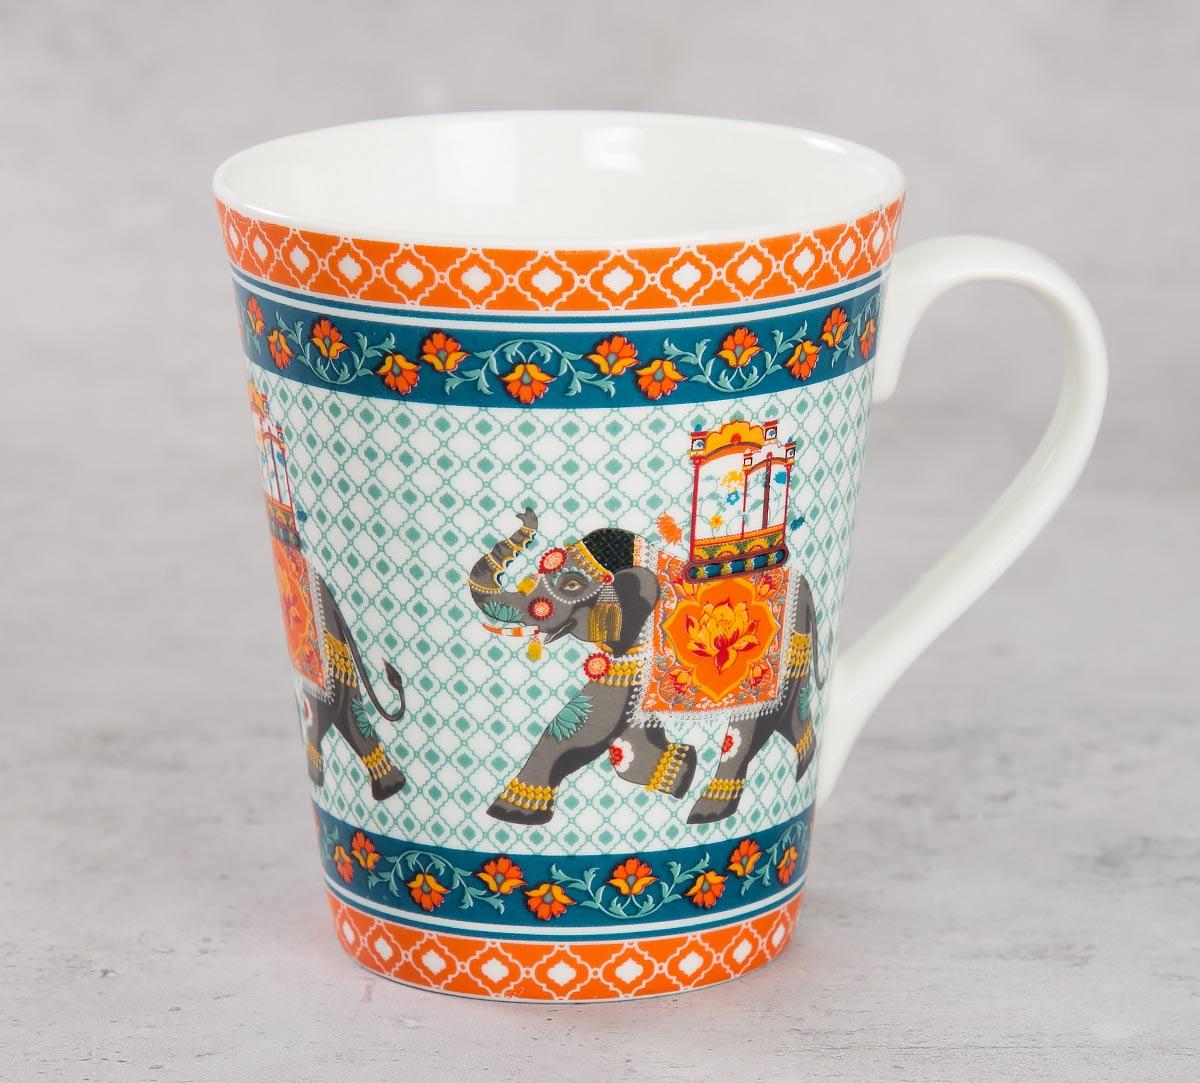 Swirling Safari Zing Mug (Set of 2)